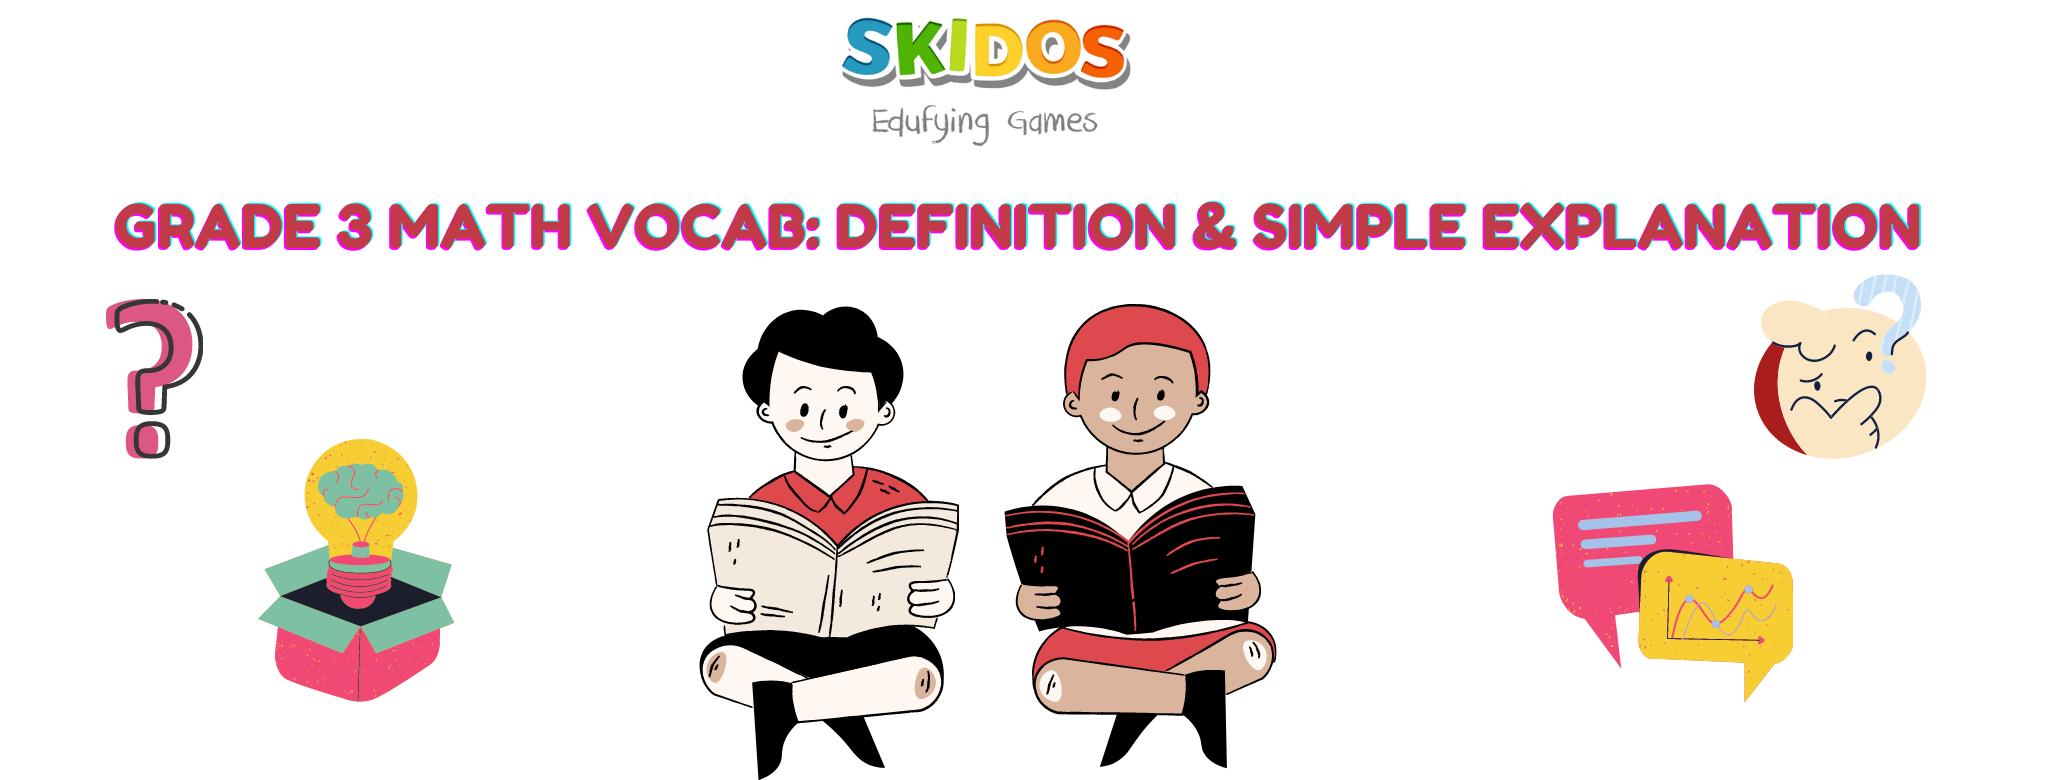 Grade 3 Math Vocabulary: Definition & Simple Explanation